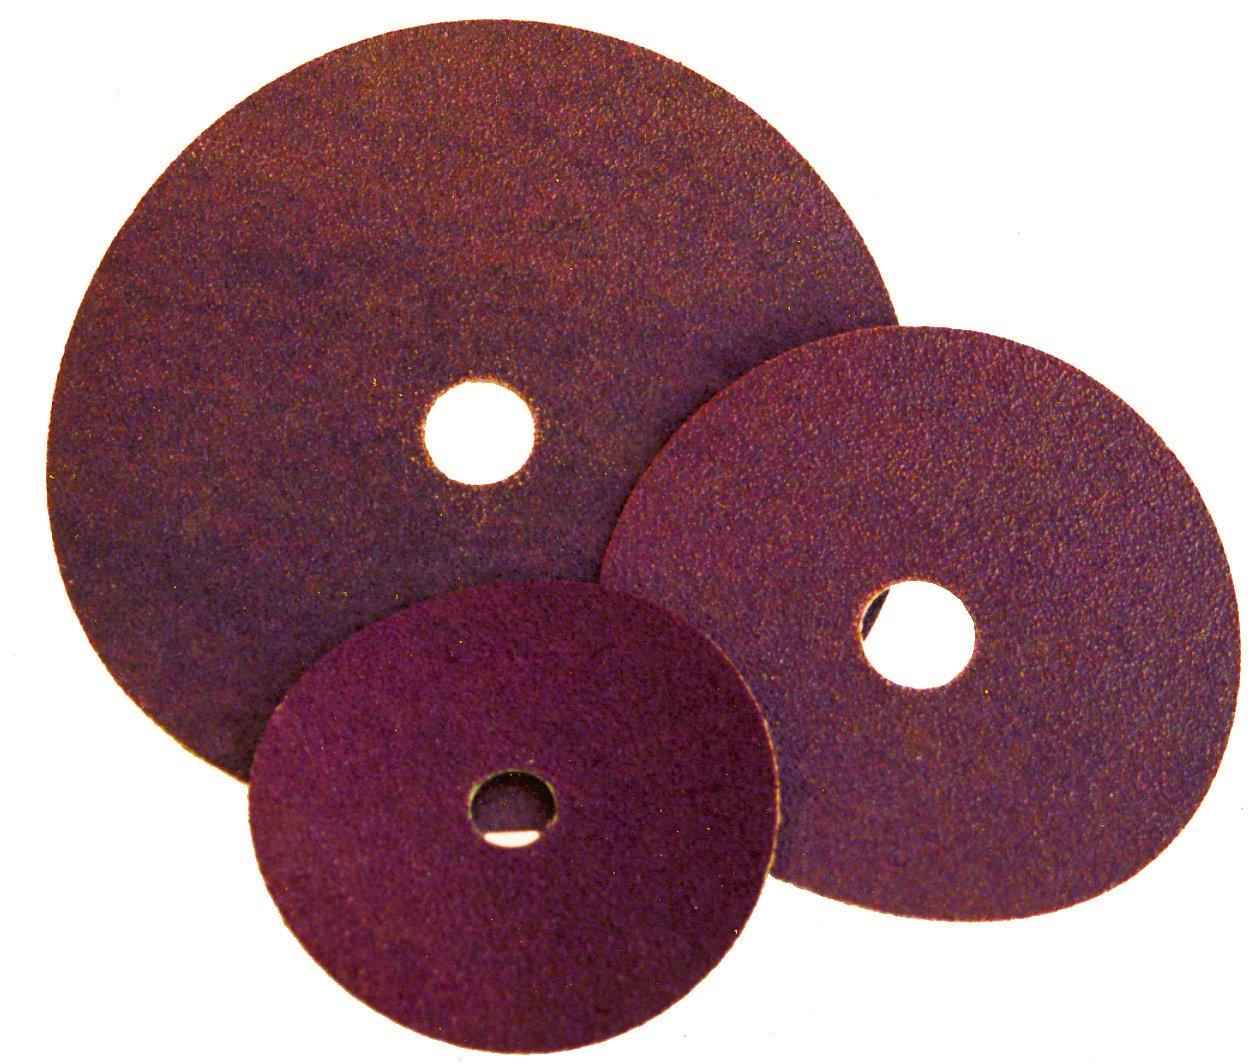 K-T Industries 5-6050 5 x 16 Grit Sanding Disc